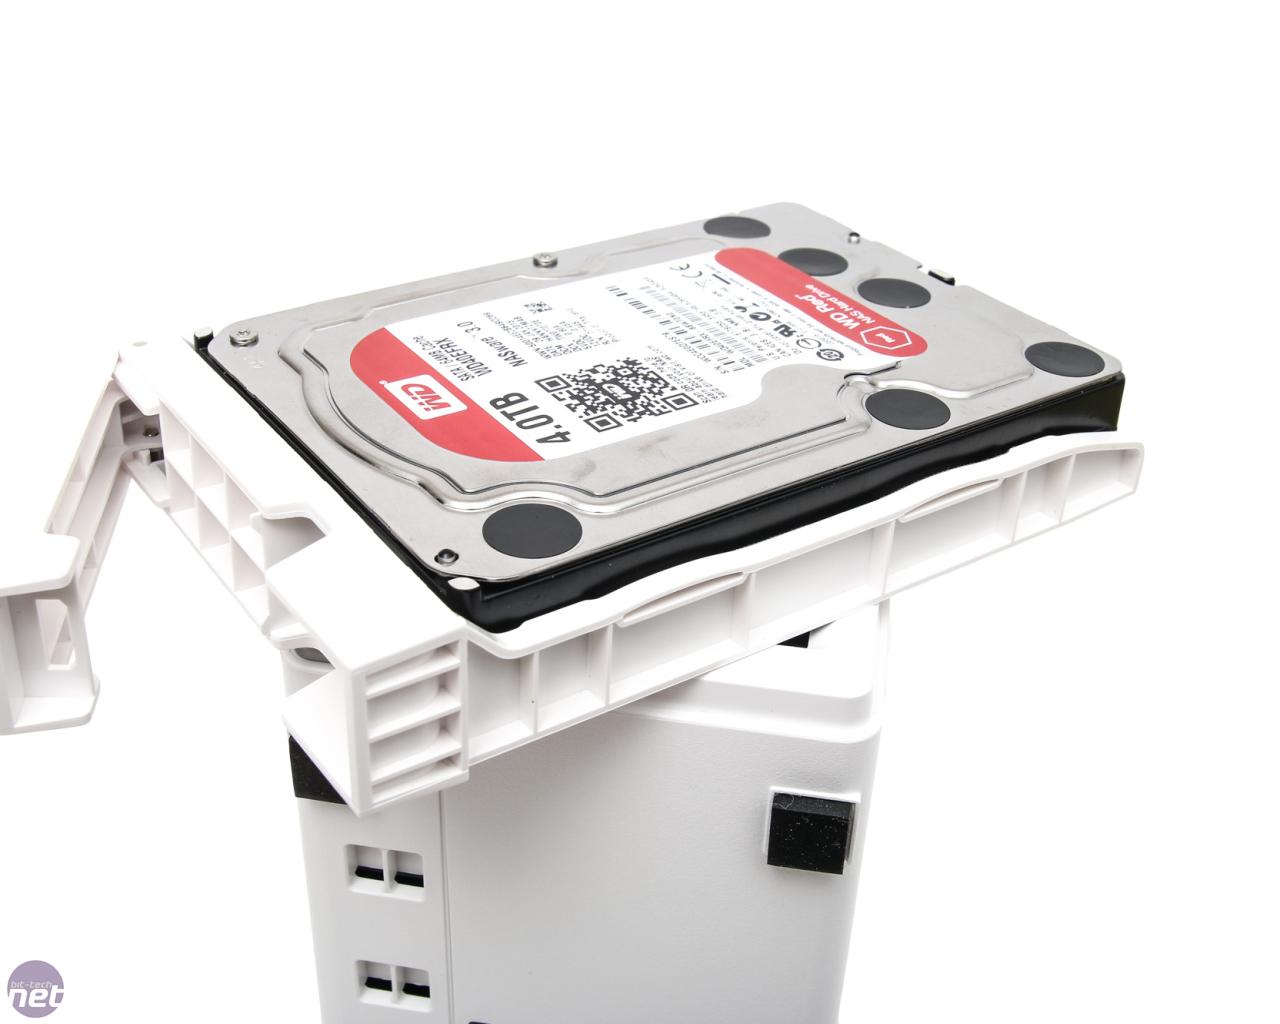 Qnap Ts 231 Review 228 2 Bay Nas Server External Storage Click To Enlarge